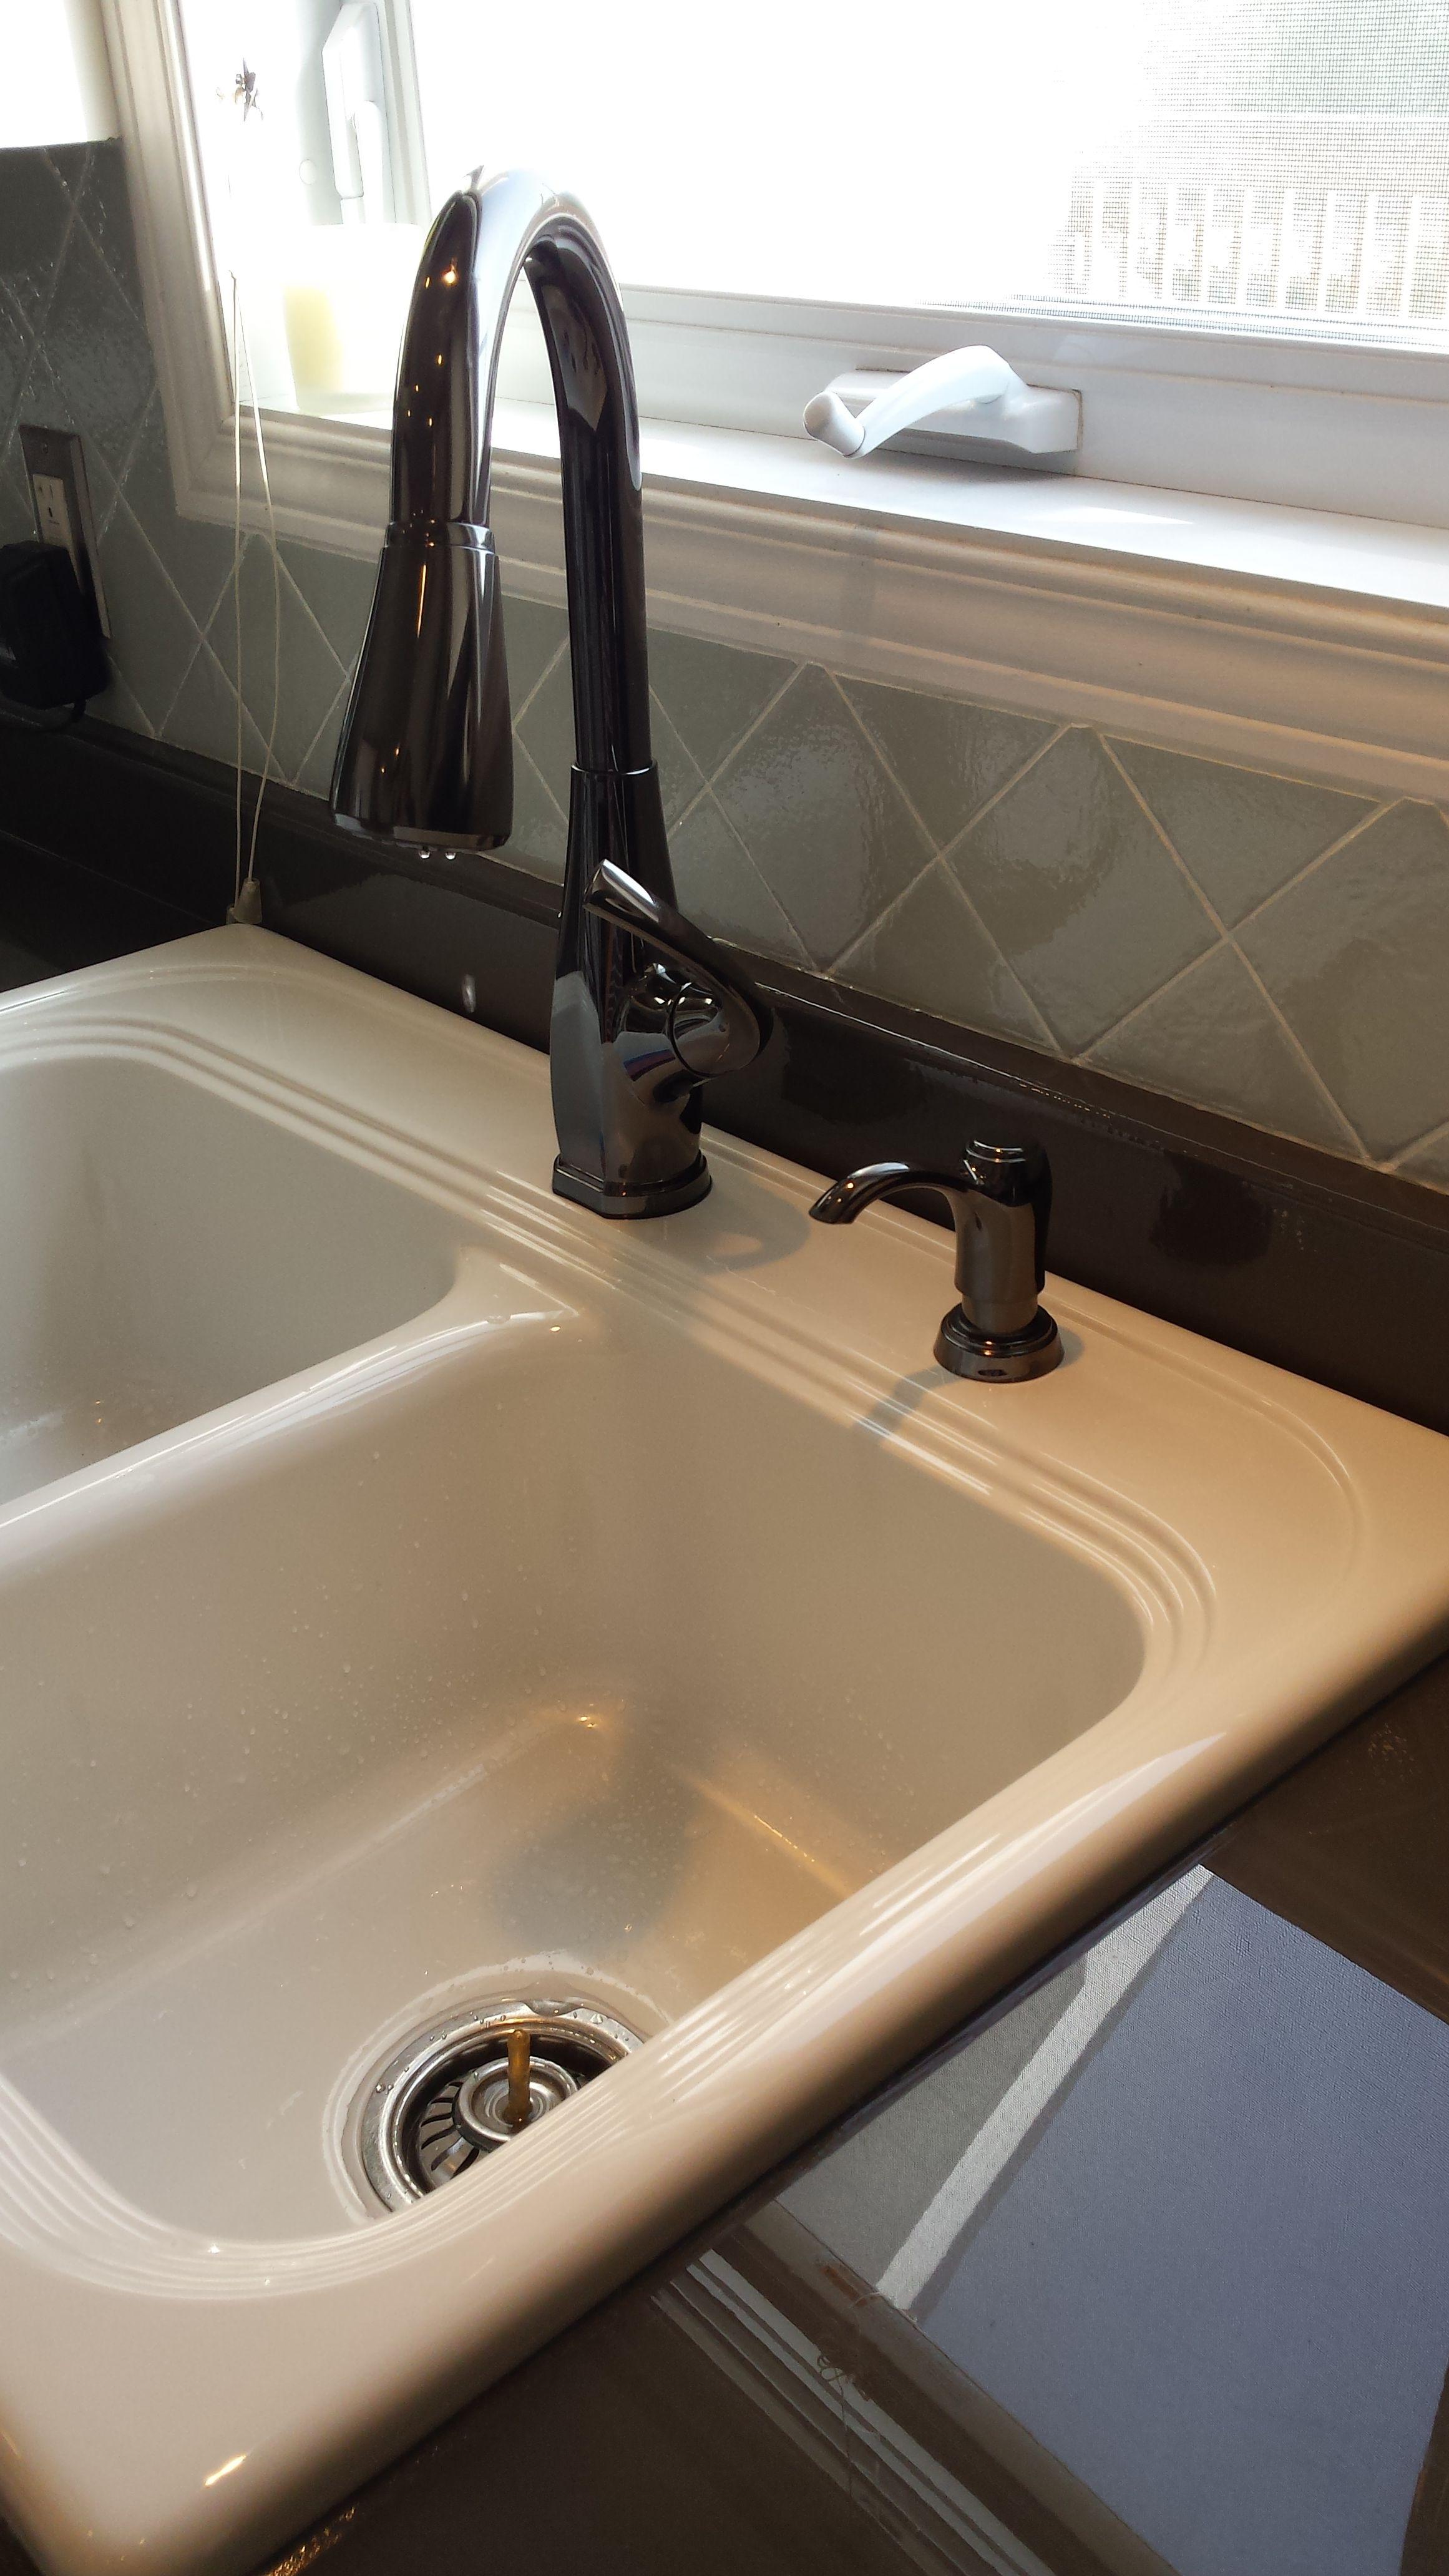 Epoxy Countertop White sink Painted ceramic backsplash | DIY